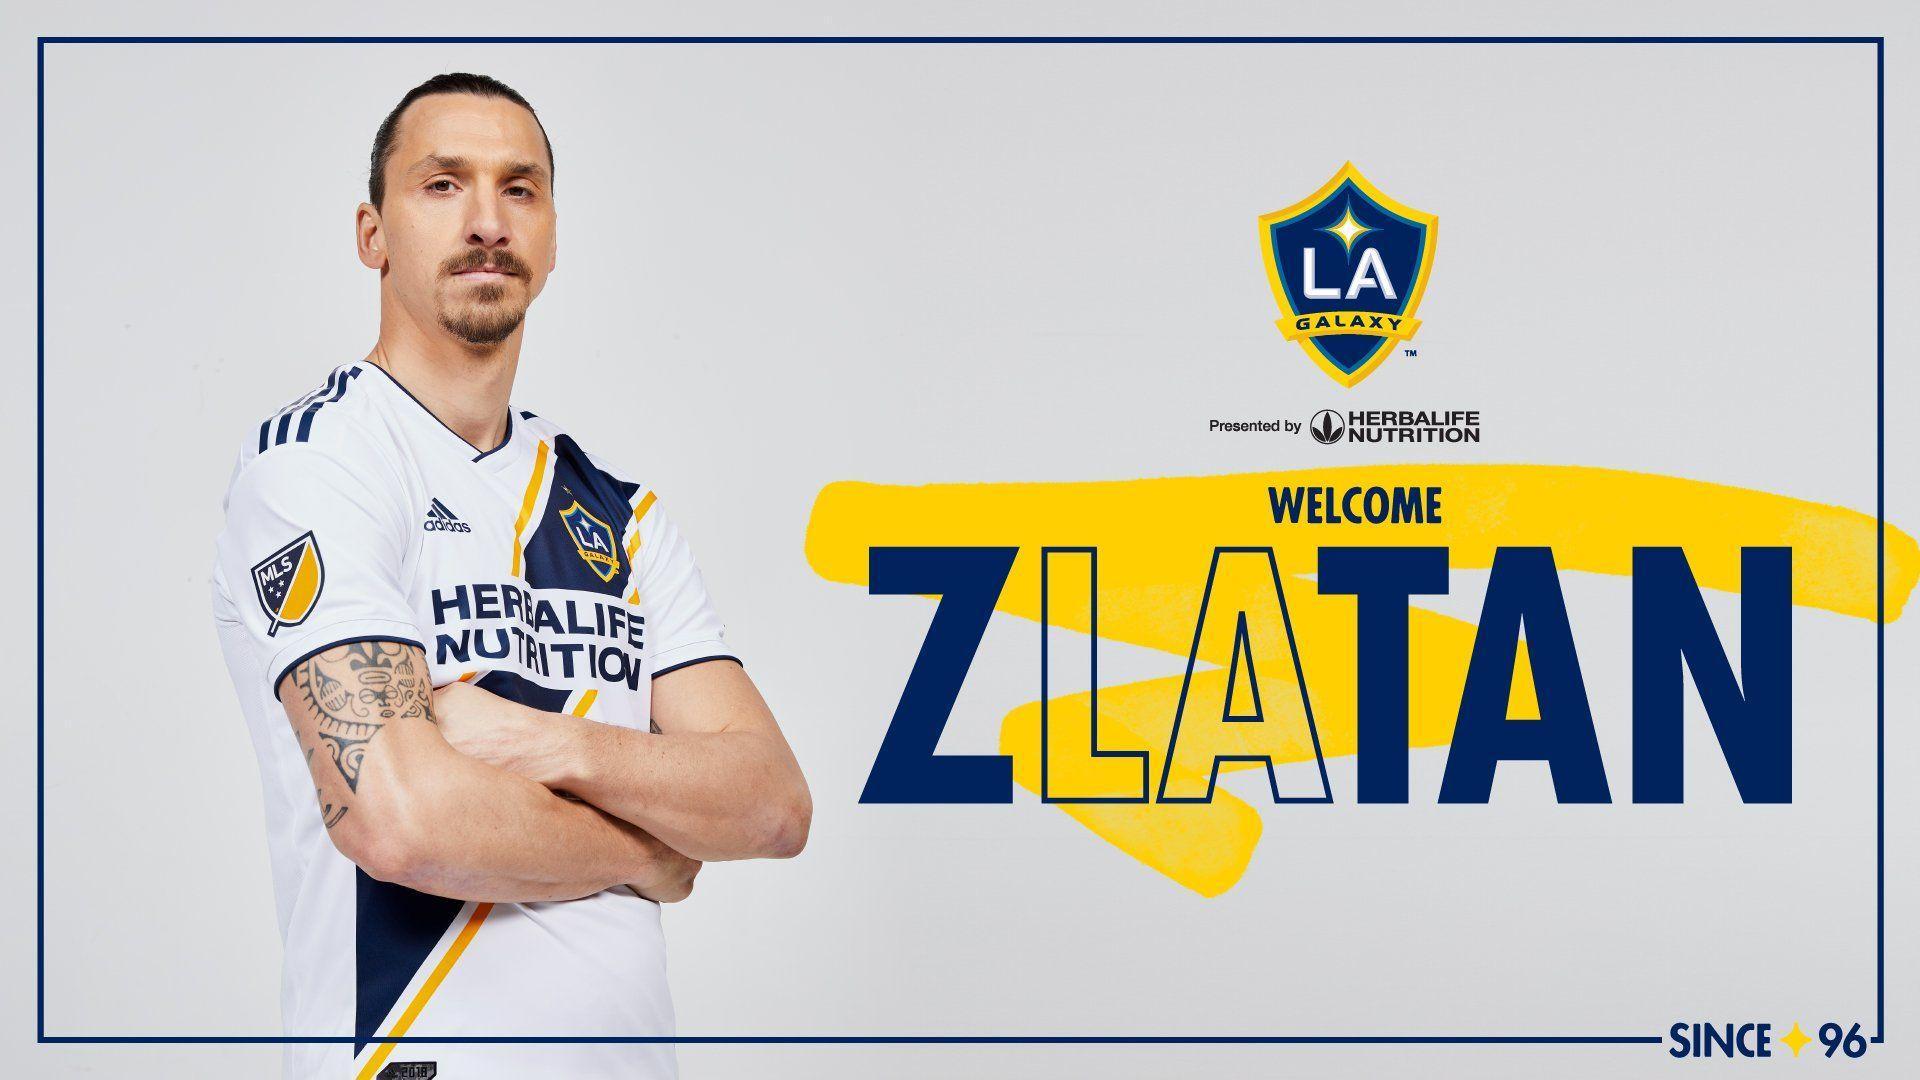 bea350024cf LA Galaxy Confirm Ibrahimovic Signing, Swedish Star Excited .